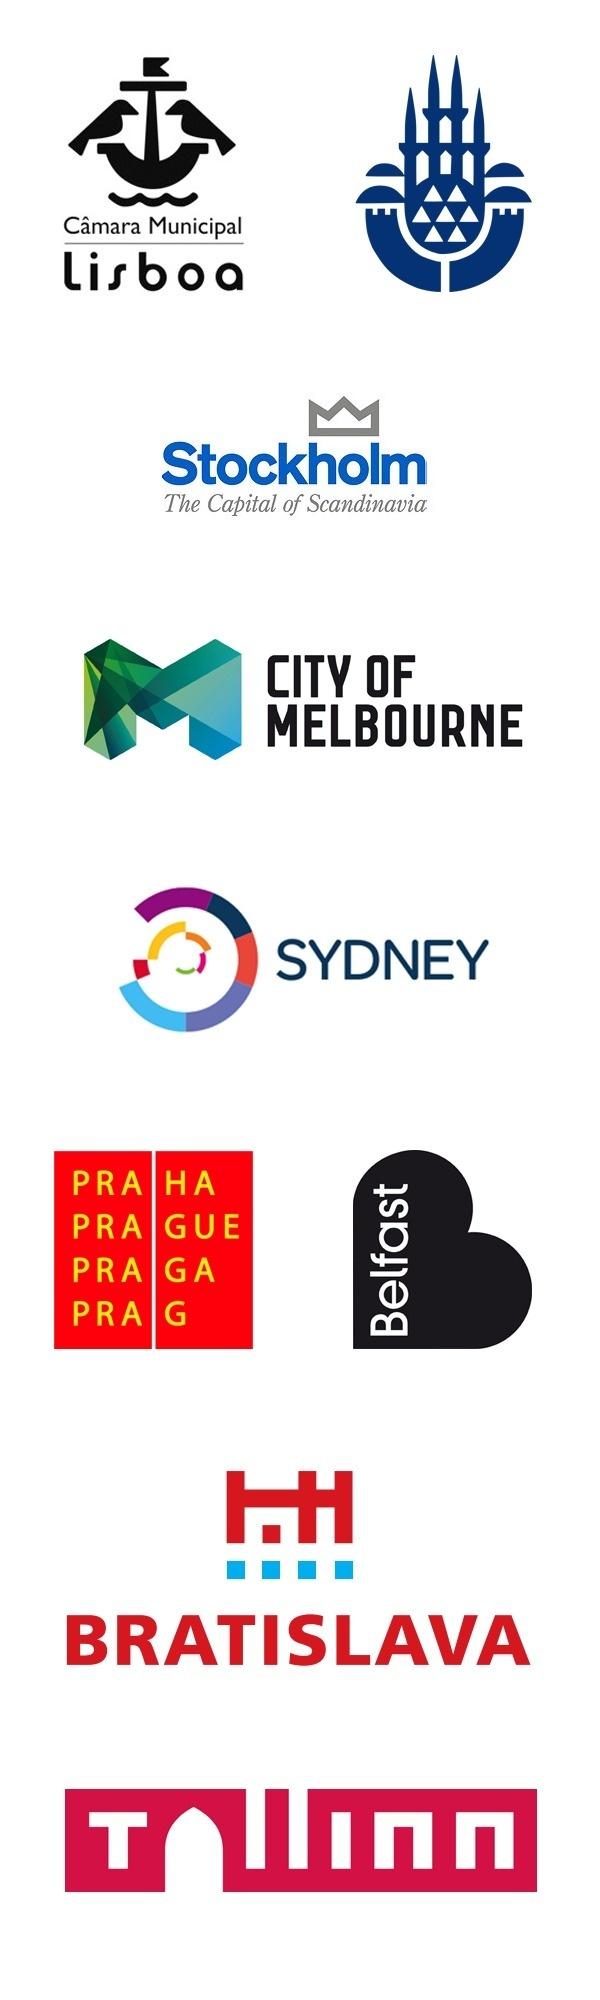 city logos #branding #city #design #travel #logo